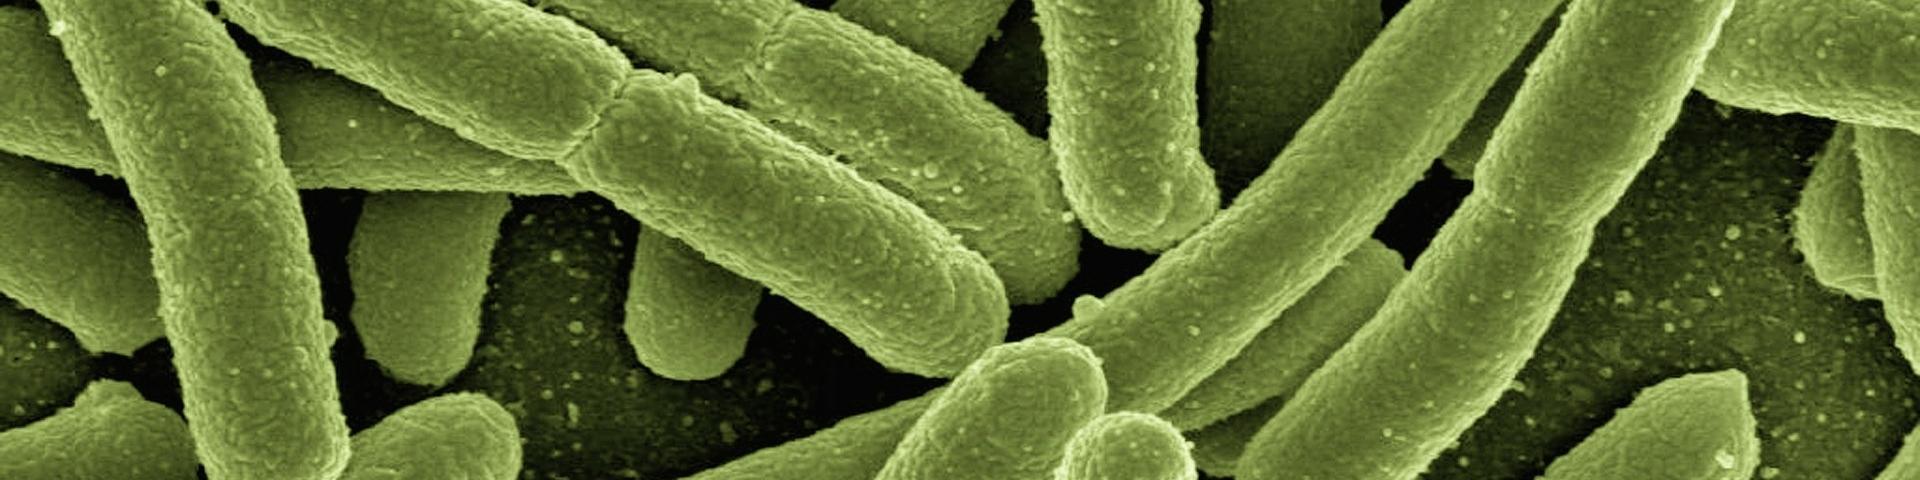 Bacterias (Escherichia coli) vistas al microscopio